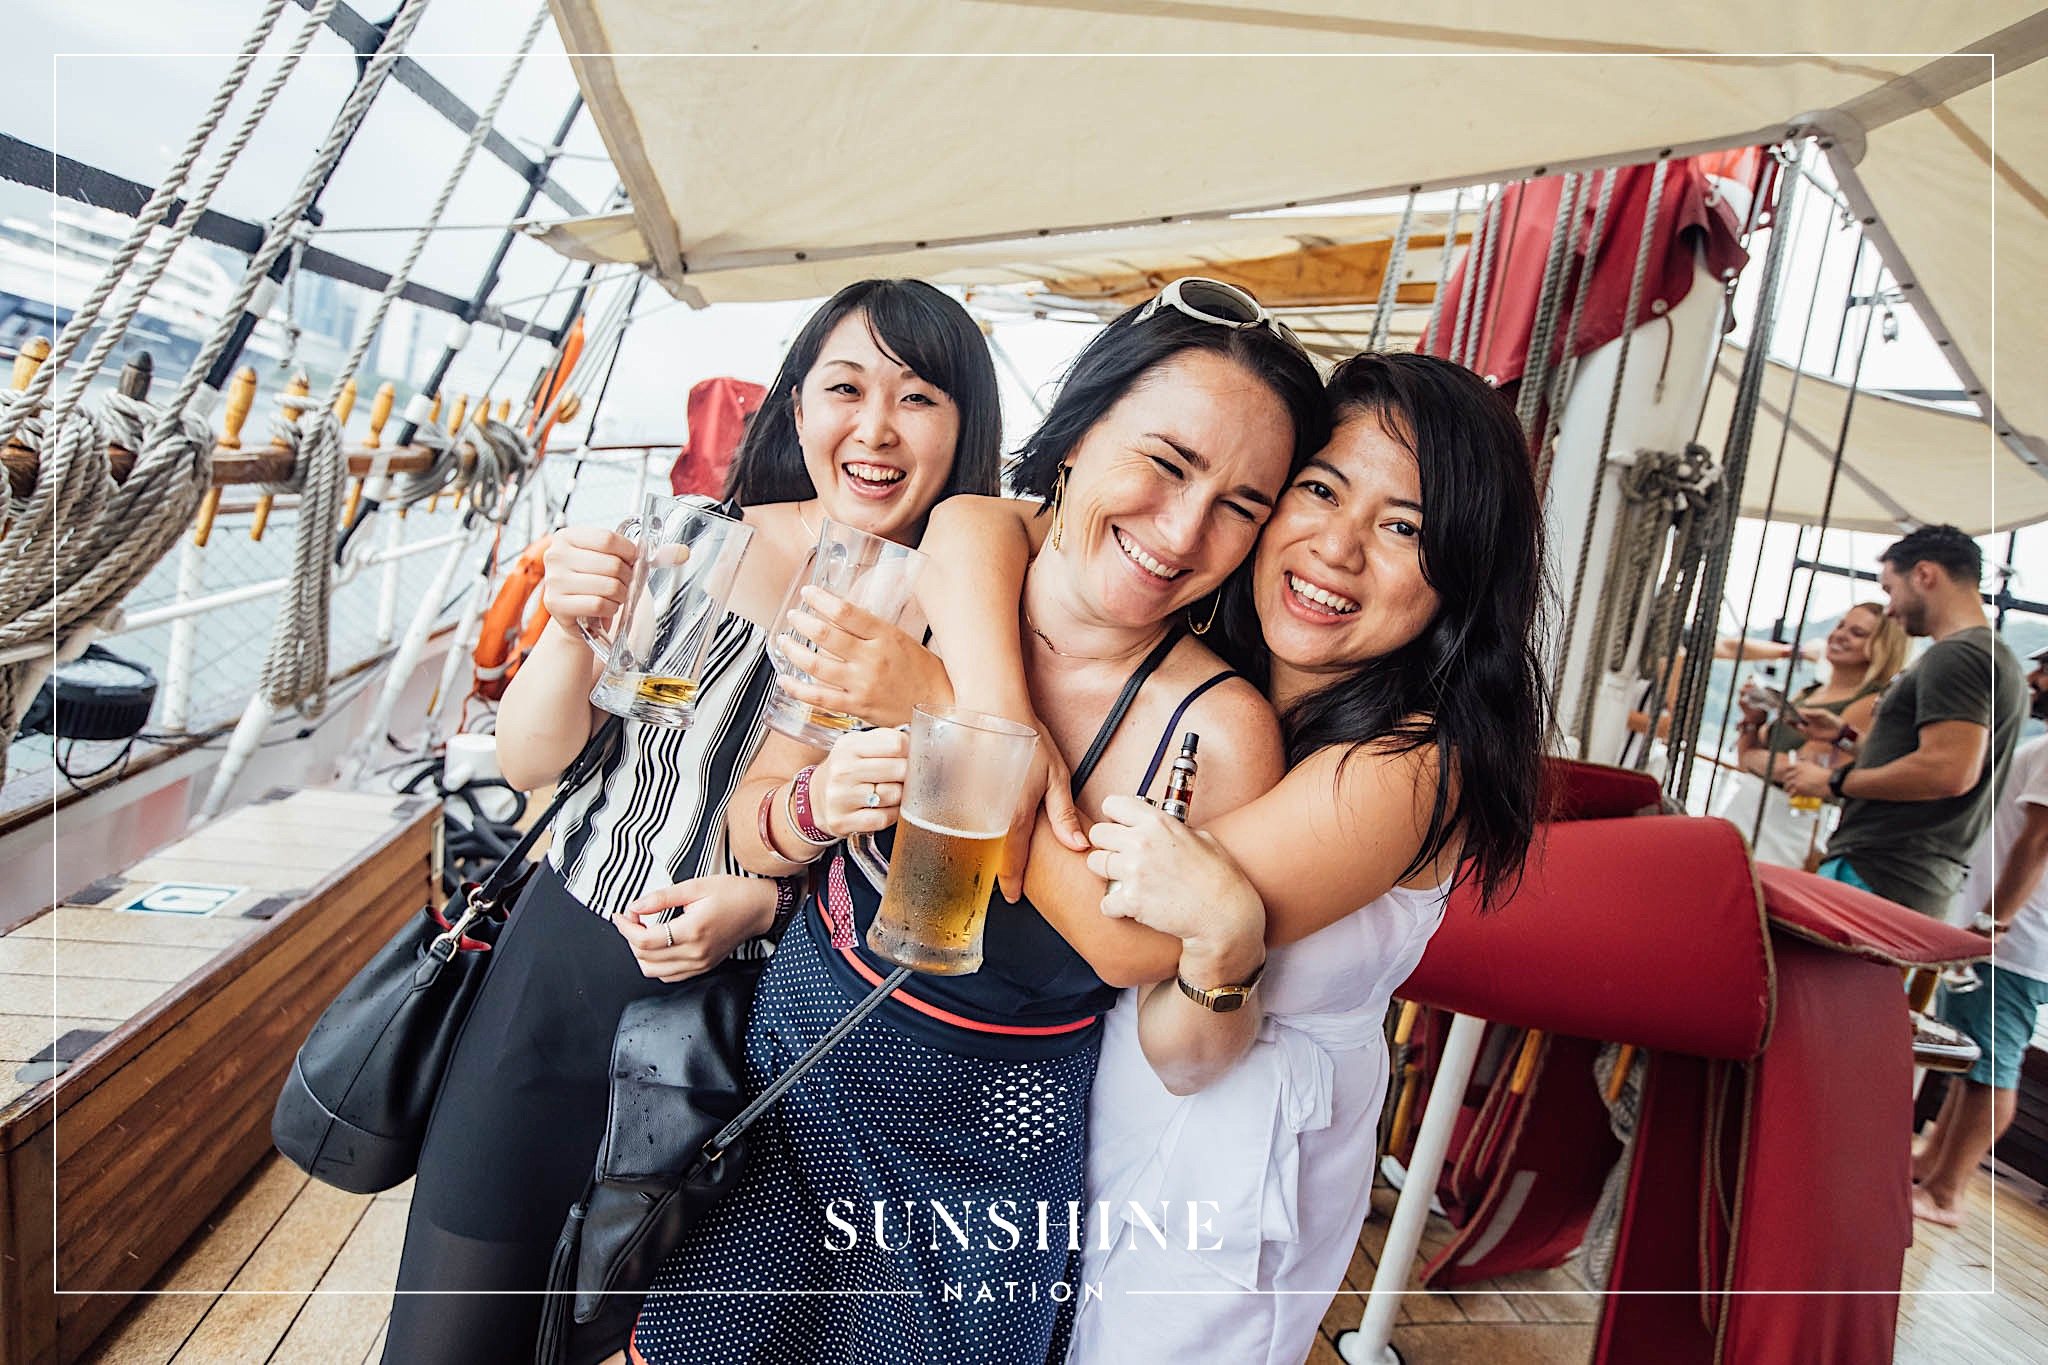 07102017_SunshineNation_Colossal022_Watermarked.jpg